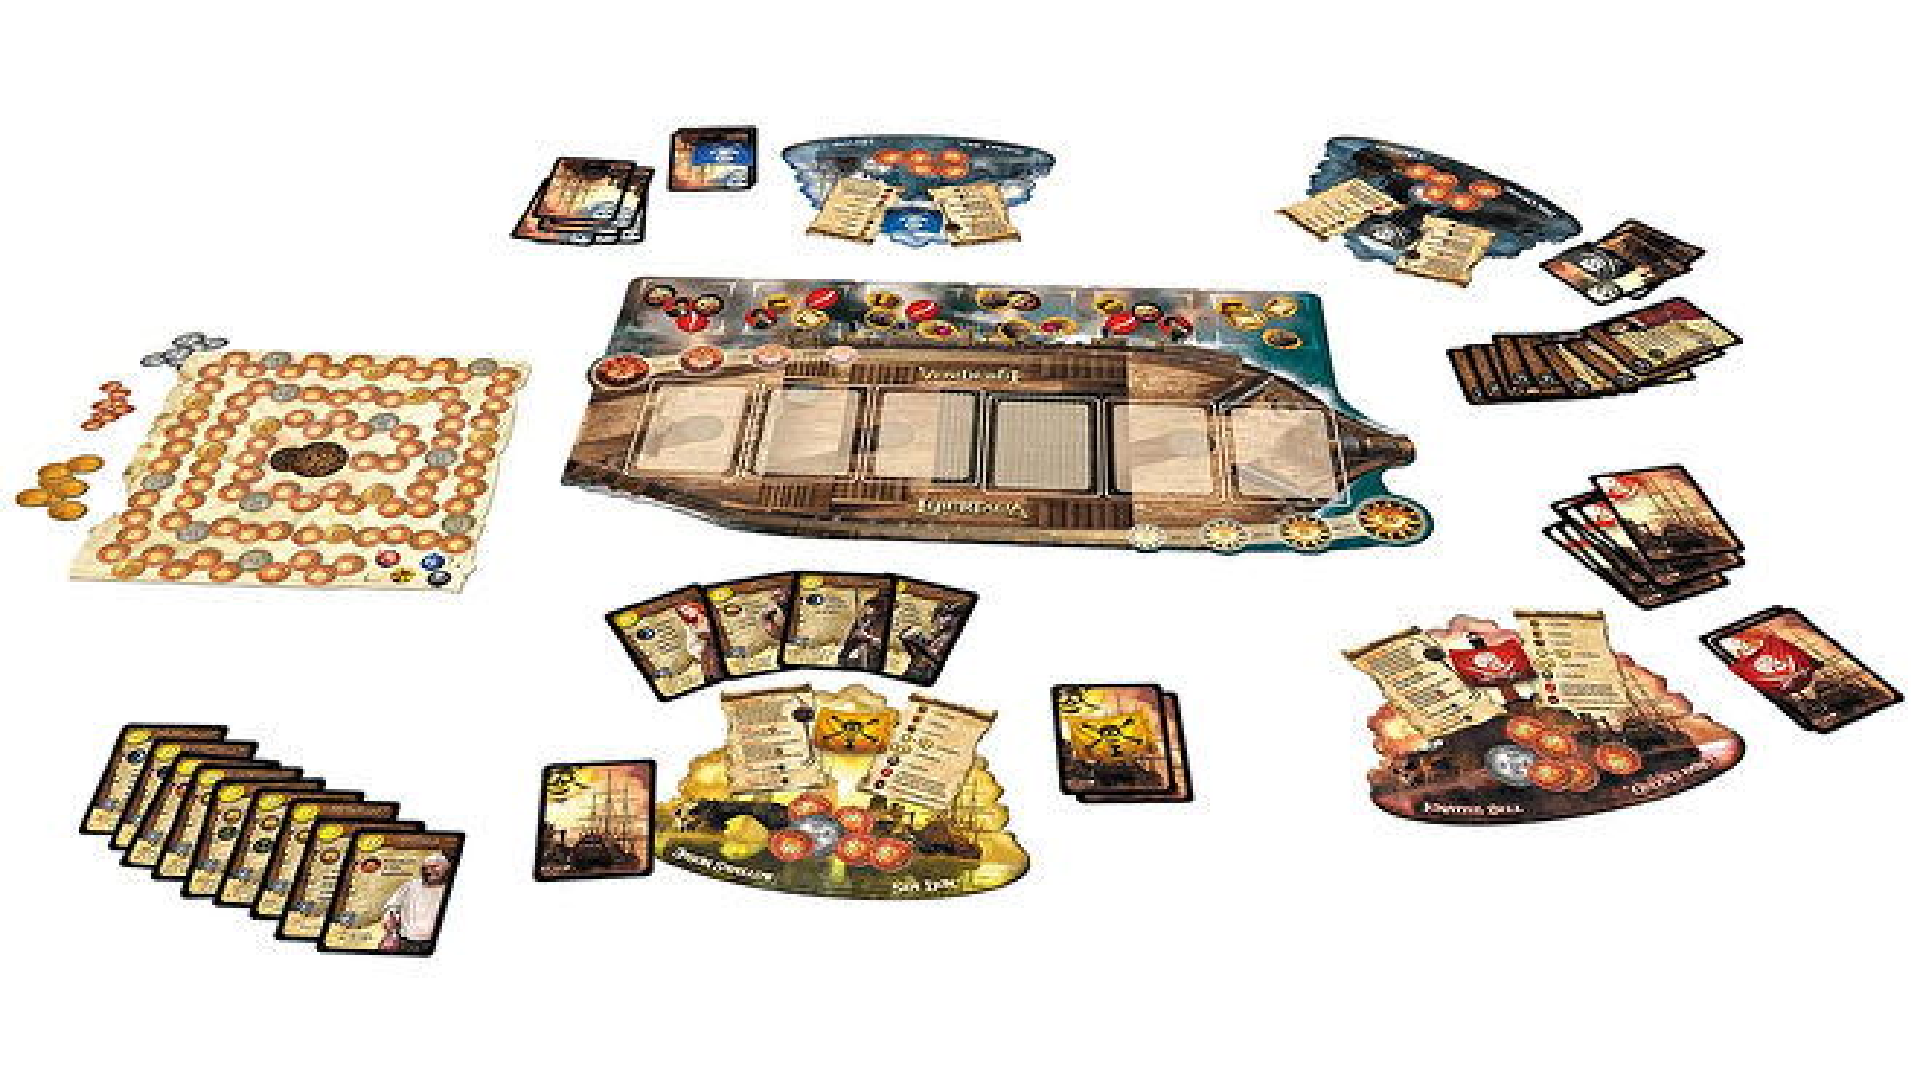 libertalia-board-game-gameplay-layout.jpg